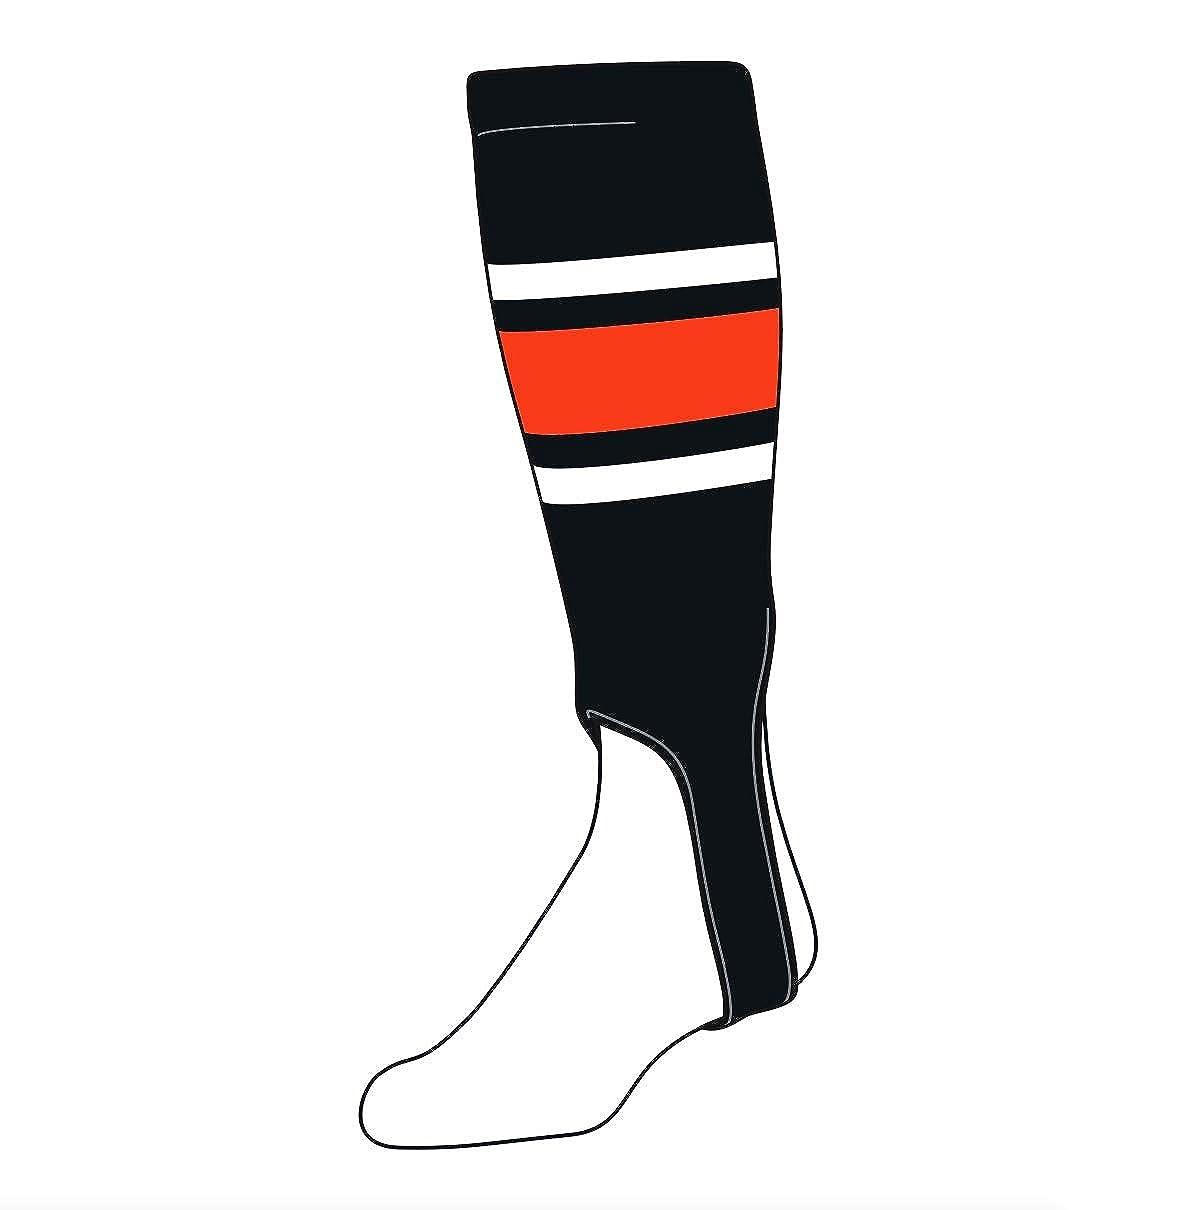 TCK Socks (16+ SOCKSHOSIERY メンズ US サイズ: US Large 19 inch inch (16+ years) B07MQWM7R5, SOLT AND PEPPER:bc947662 --- cgt-tbc.fr